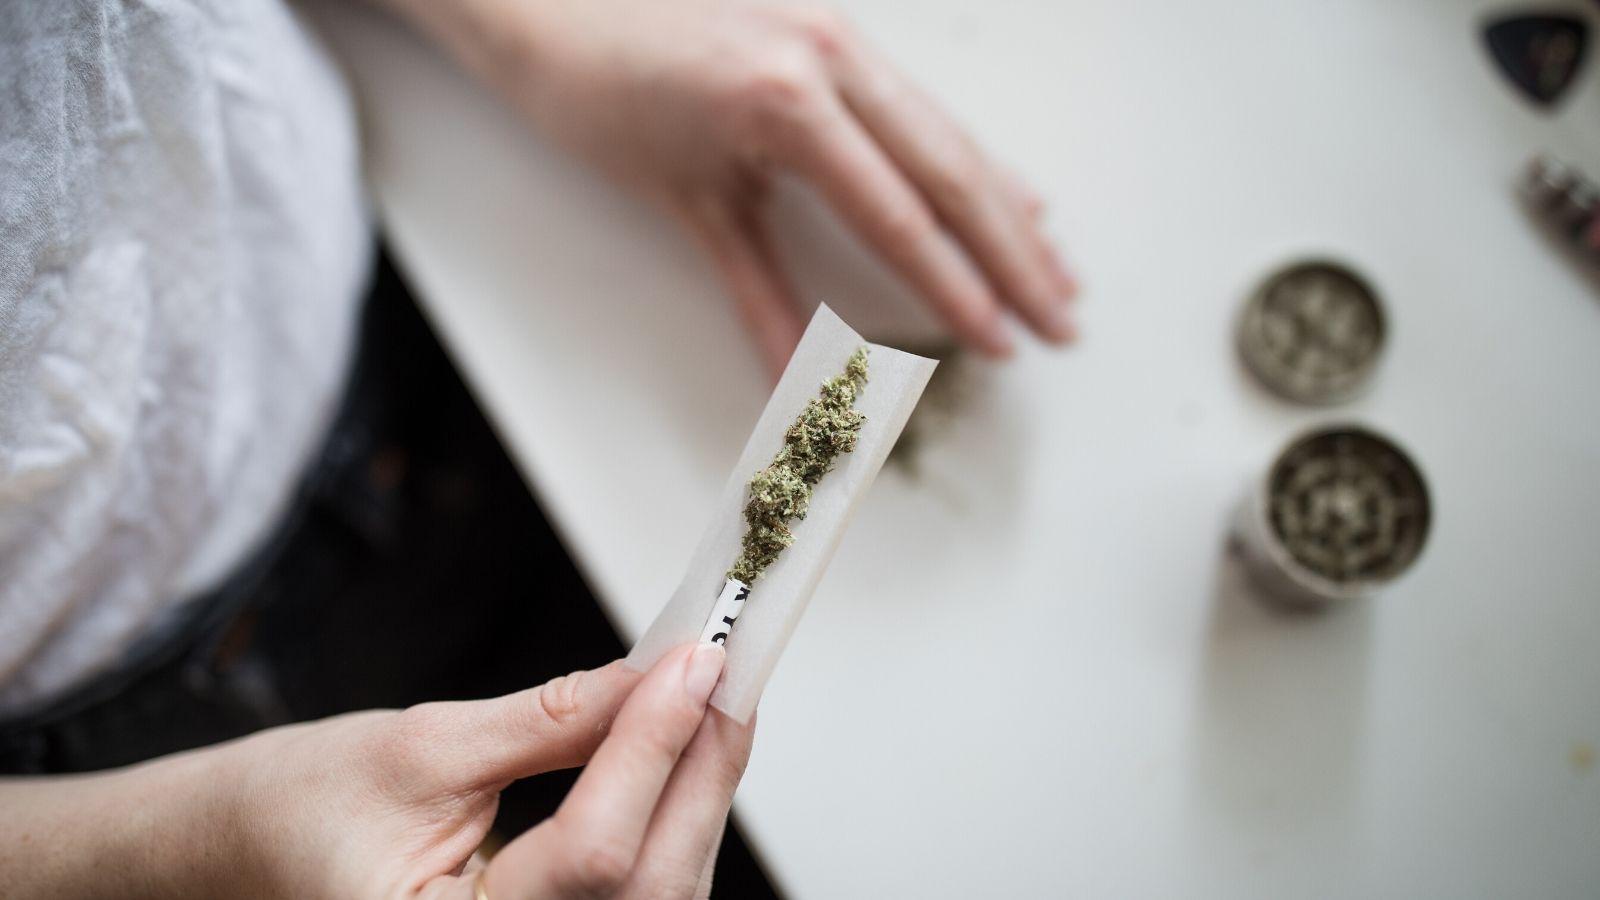 A woman rolls a cannabis joint.